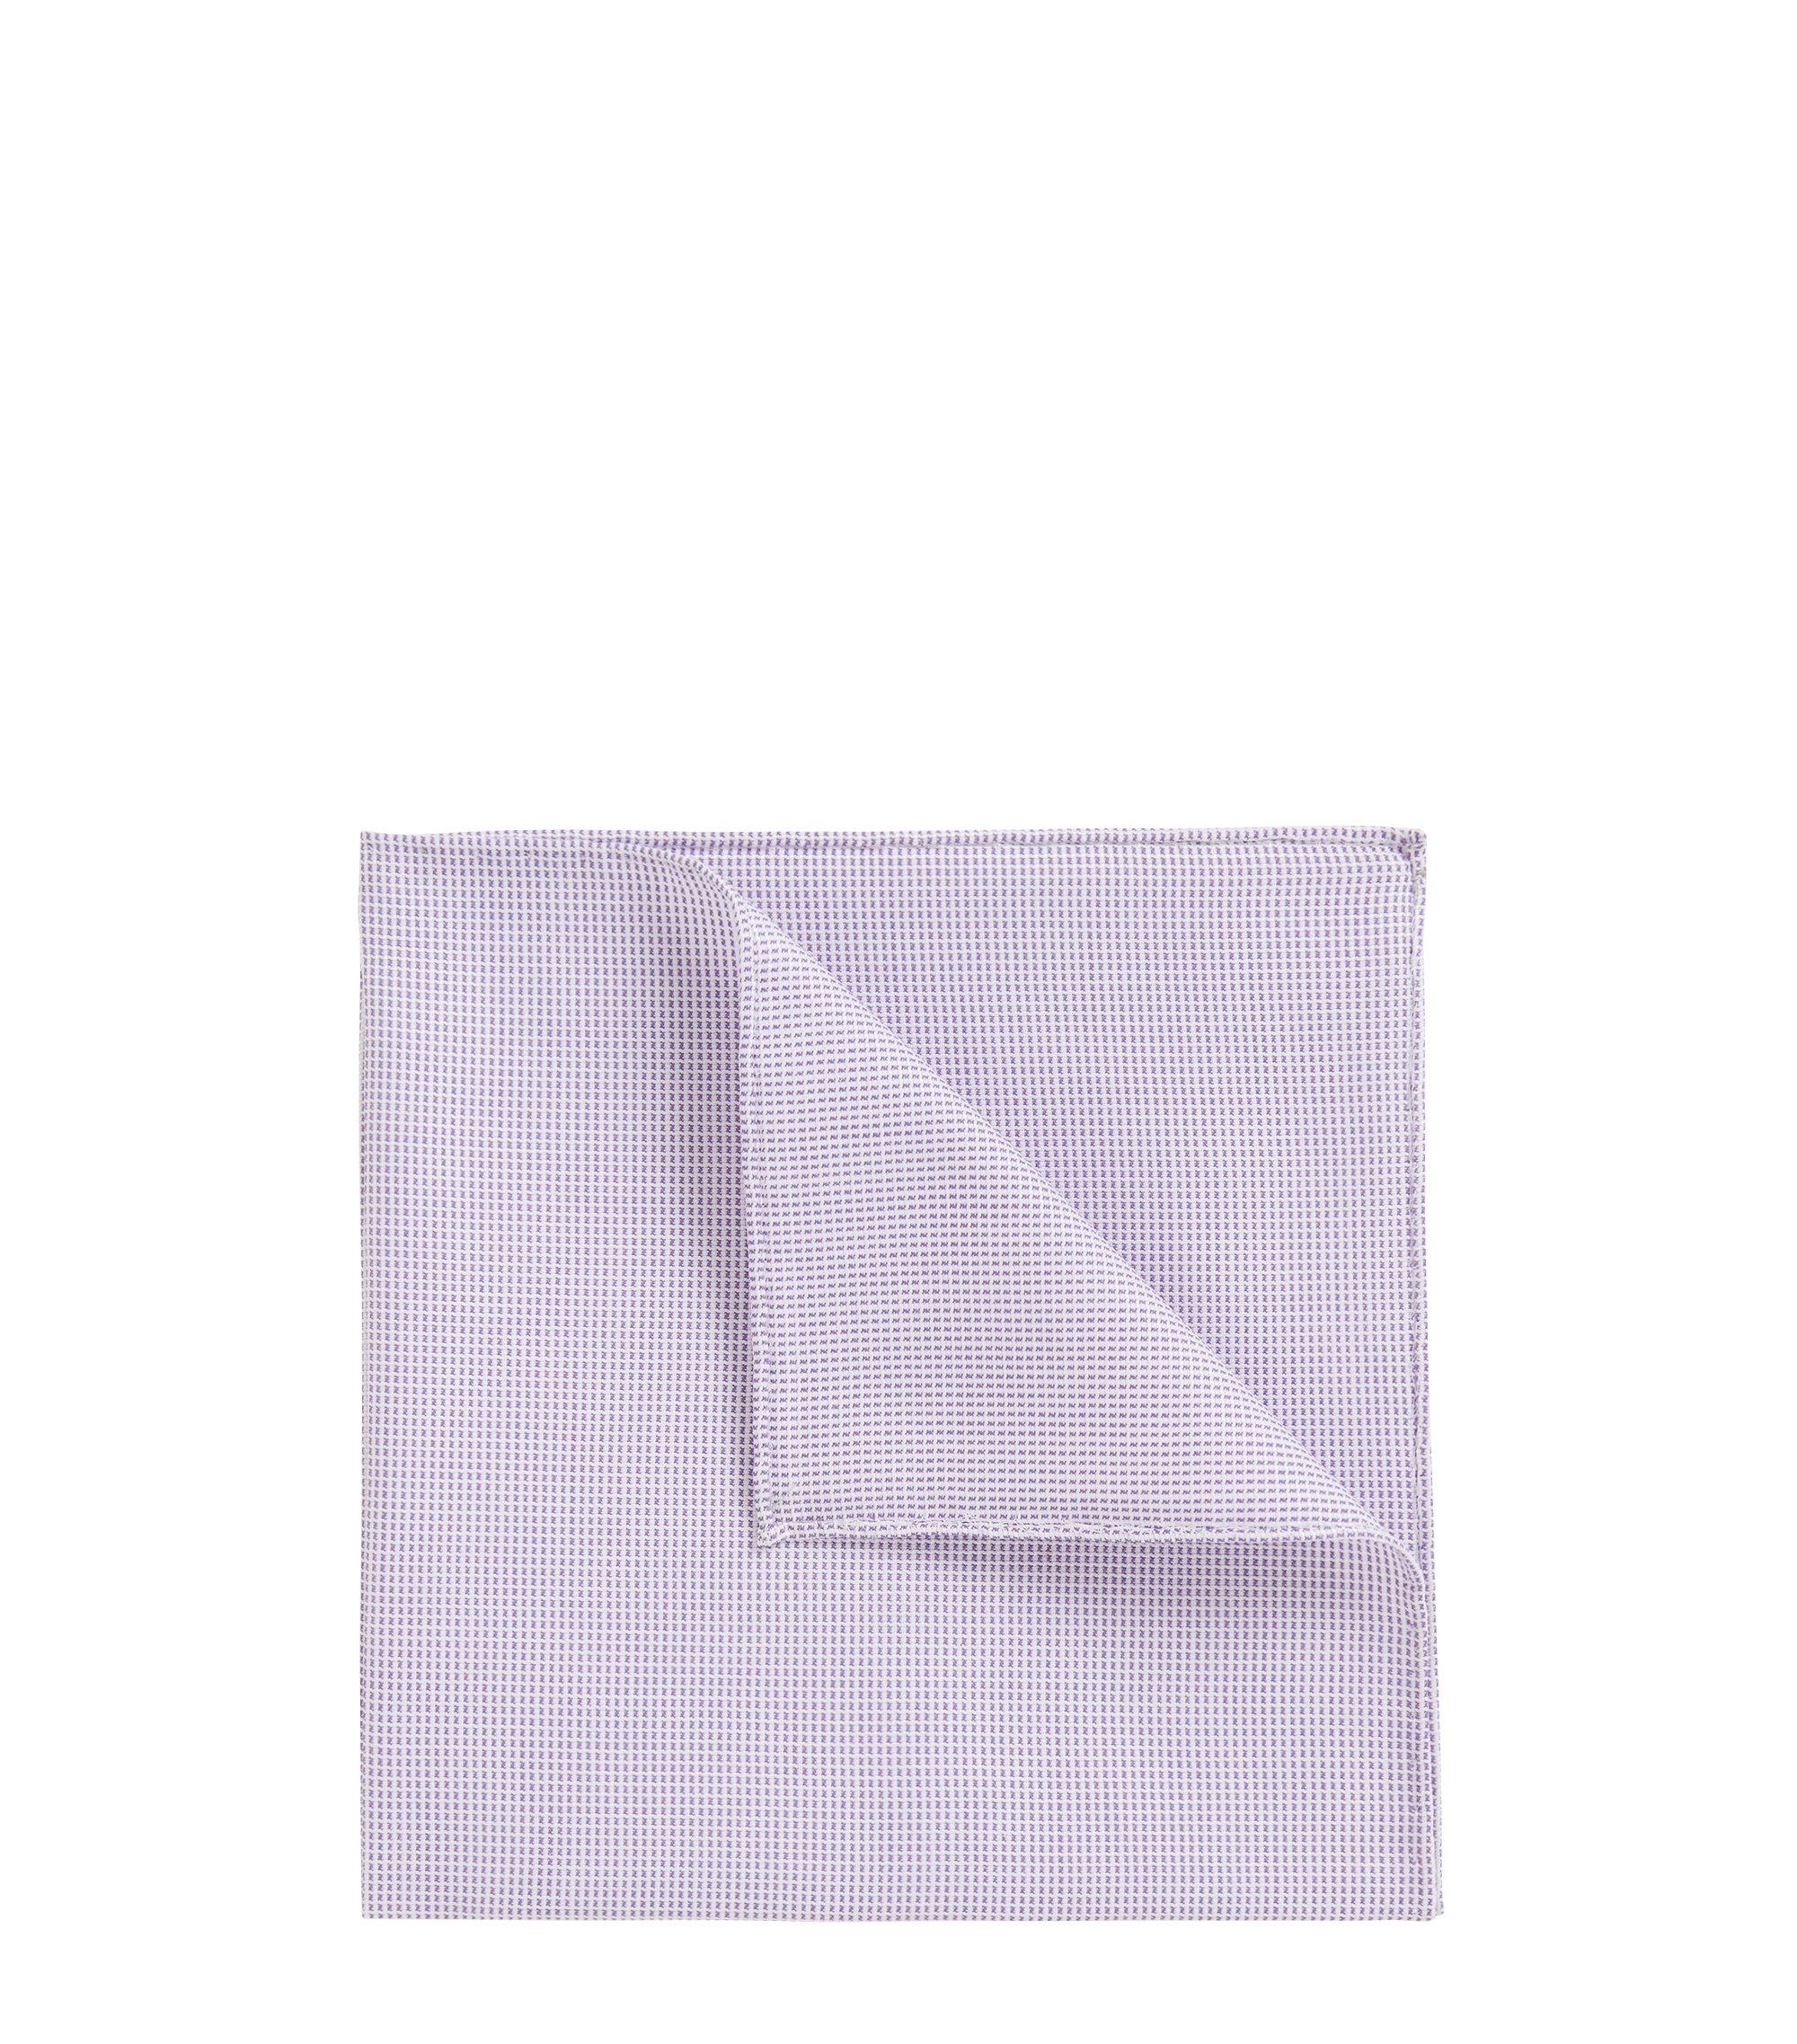 Pañuelo de bolsillo con dobladillo enrollado de jacquard en mezcla de algodón, Lila